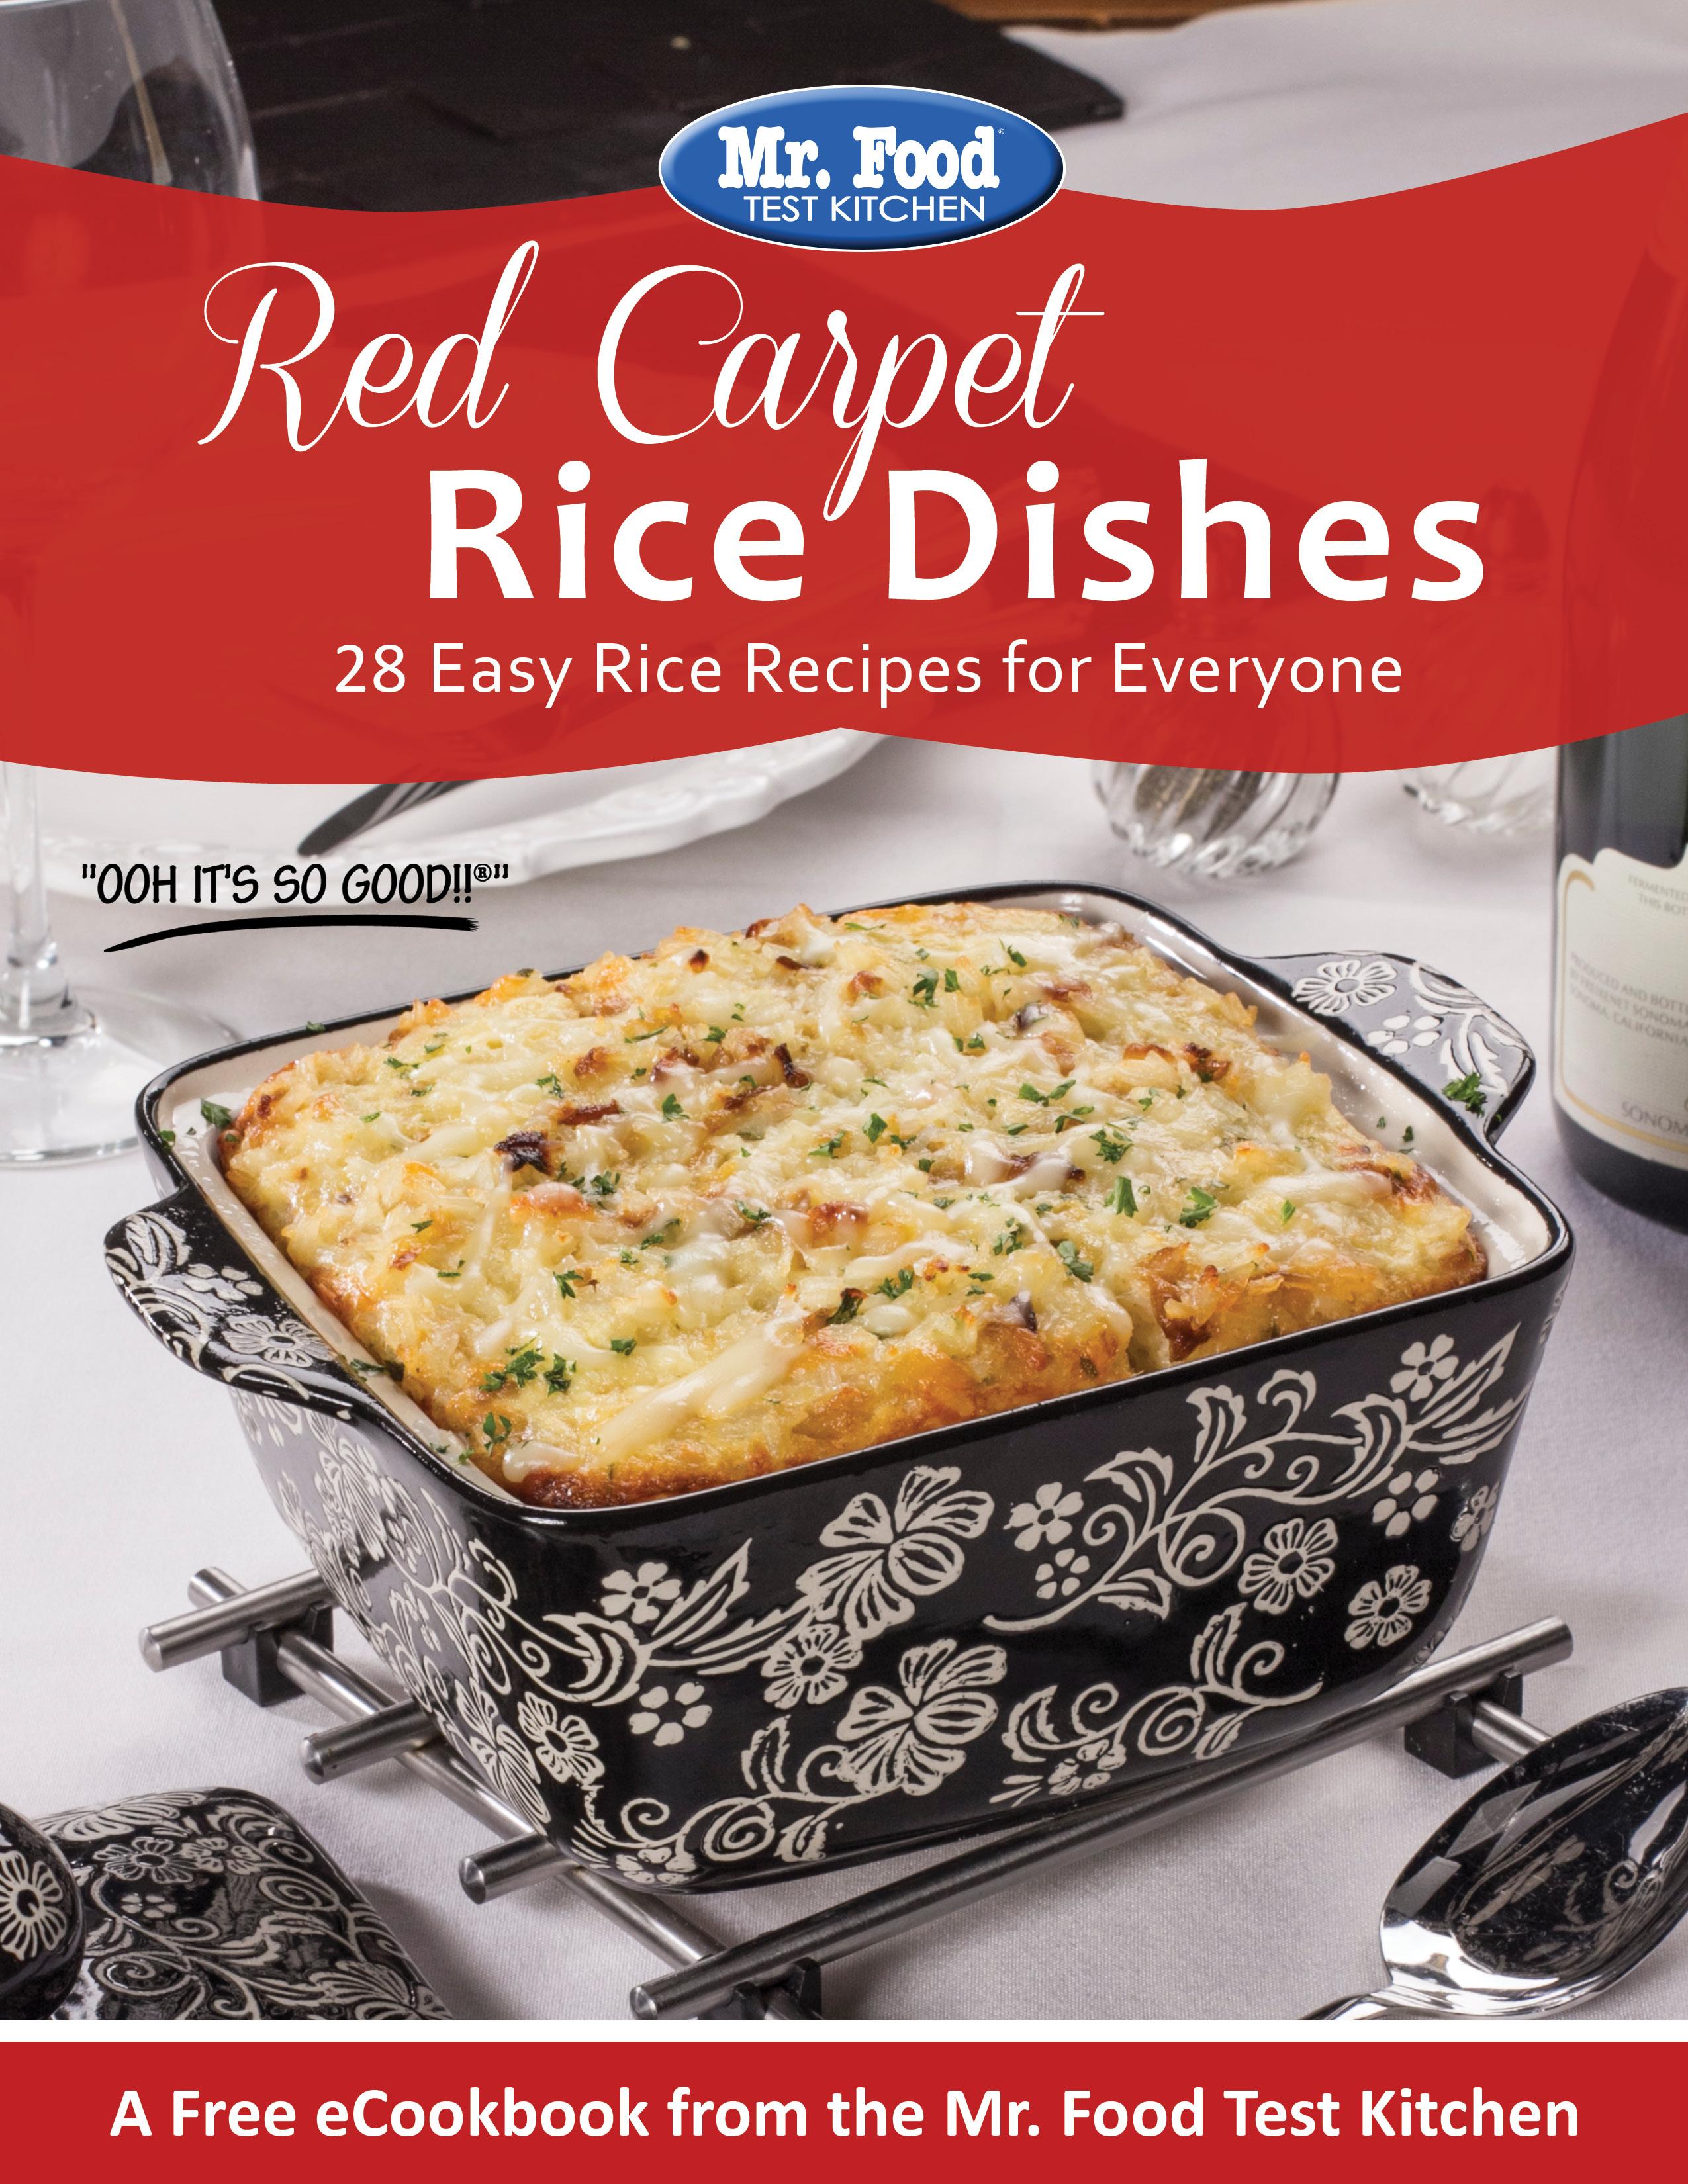 red carpet rice dishes free ecookbook mr food s blog rh mrfood com Gameday Food Gameday Food